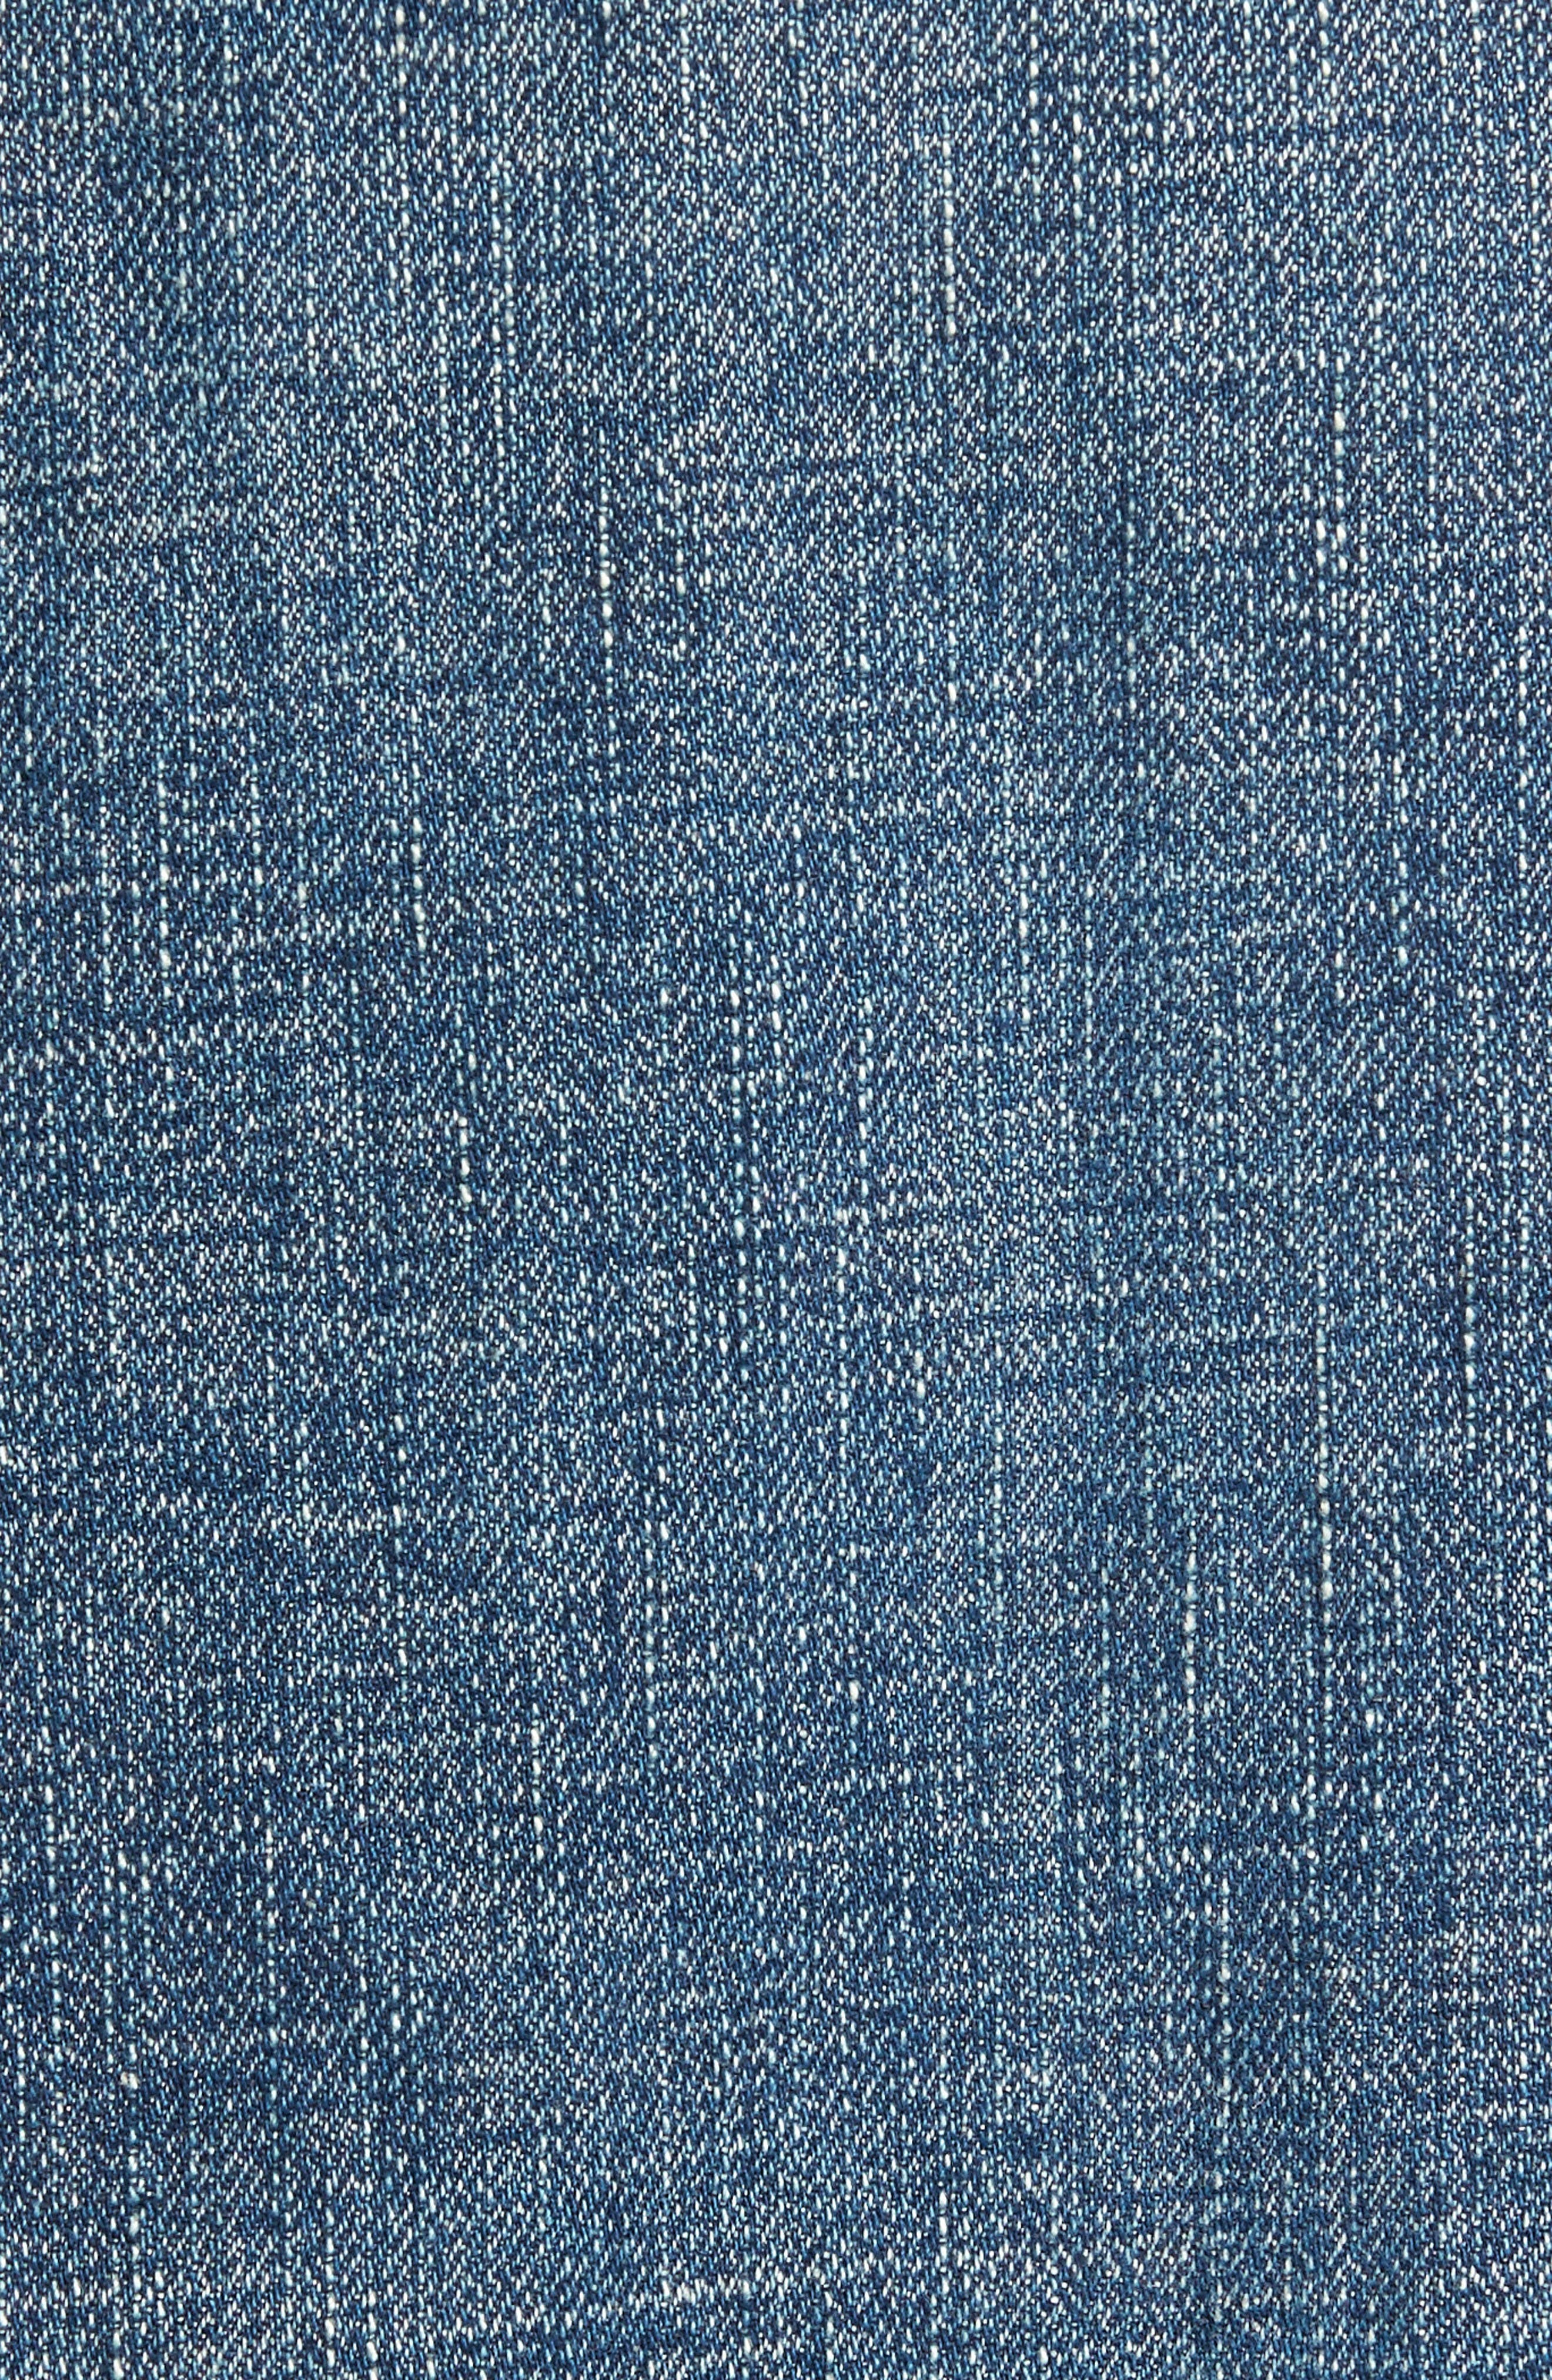 Clayton Distressed Selvedge Denim Jacket,                             Alternate thumbnail 5, color,                             Denim Wash